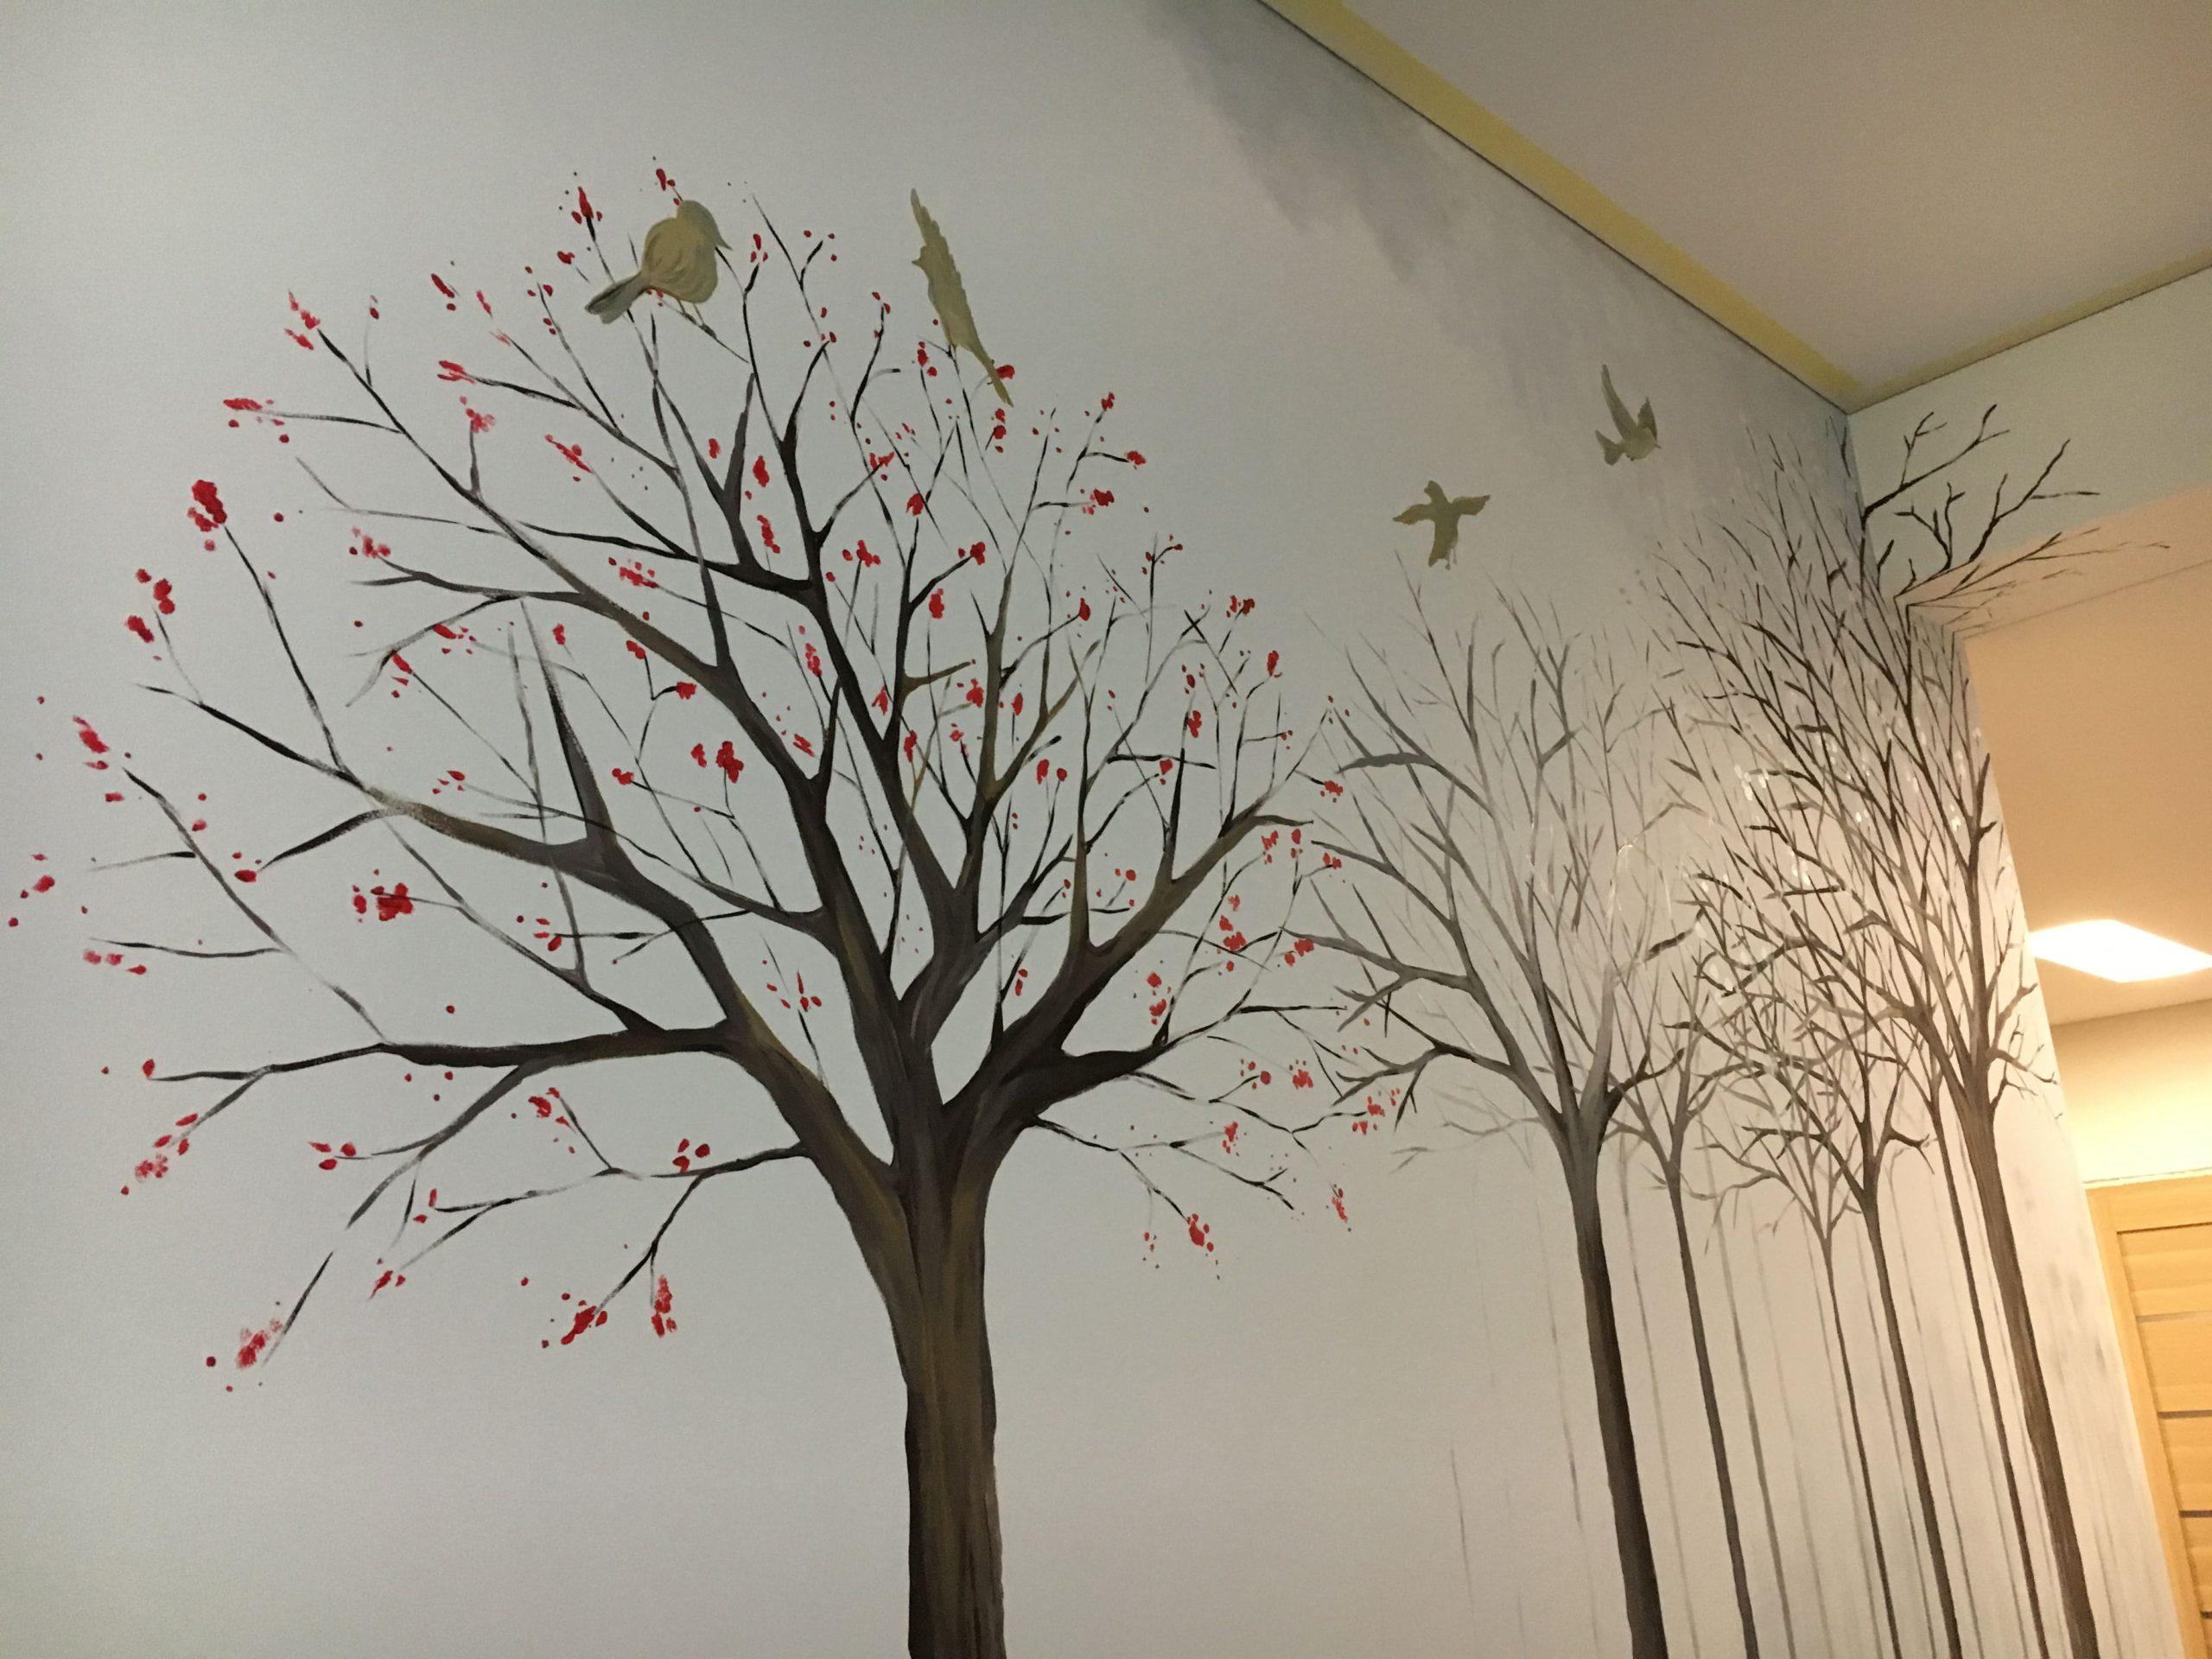 menine-kuryba-sienu-dekoravimas-ivairus-interjerai (16)